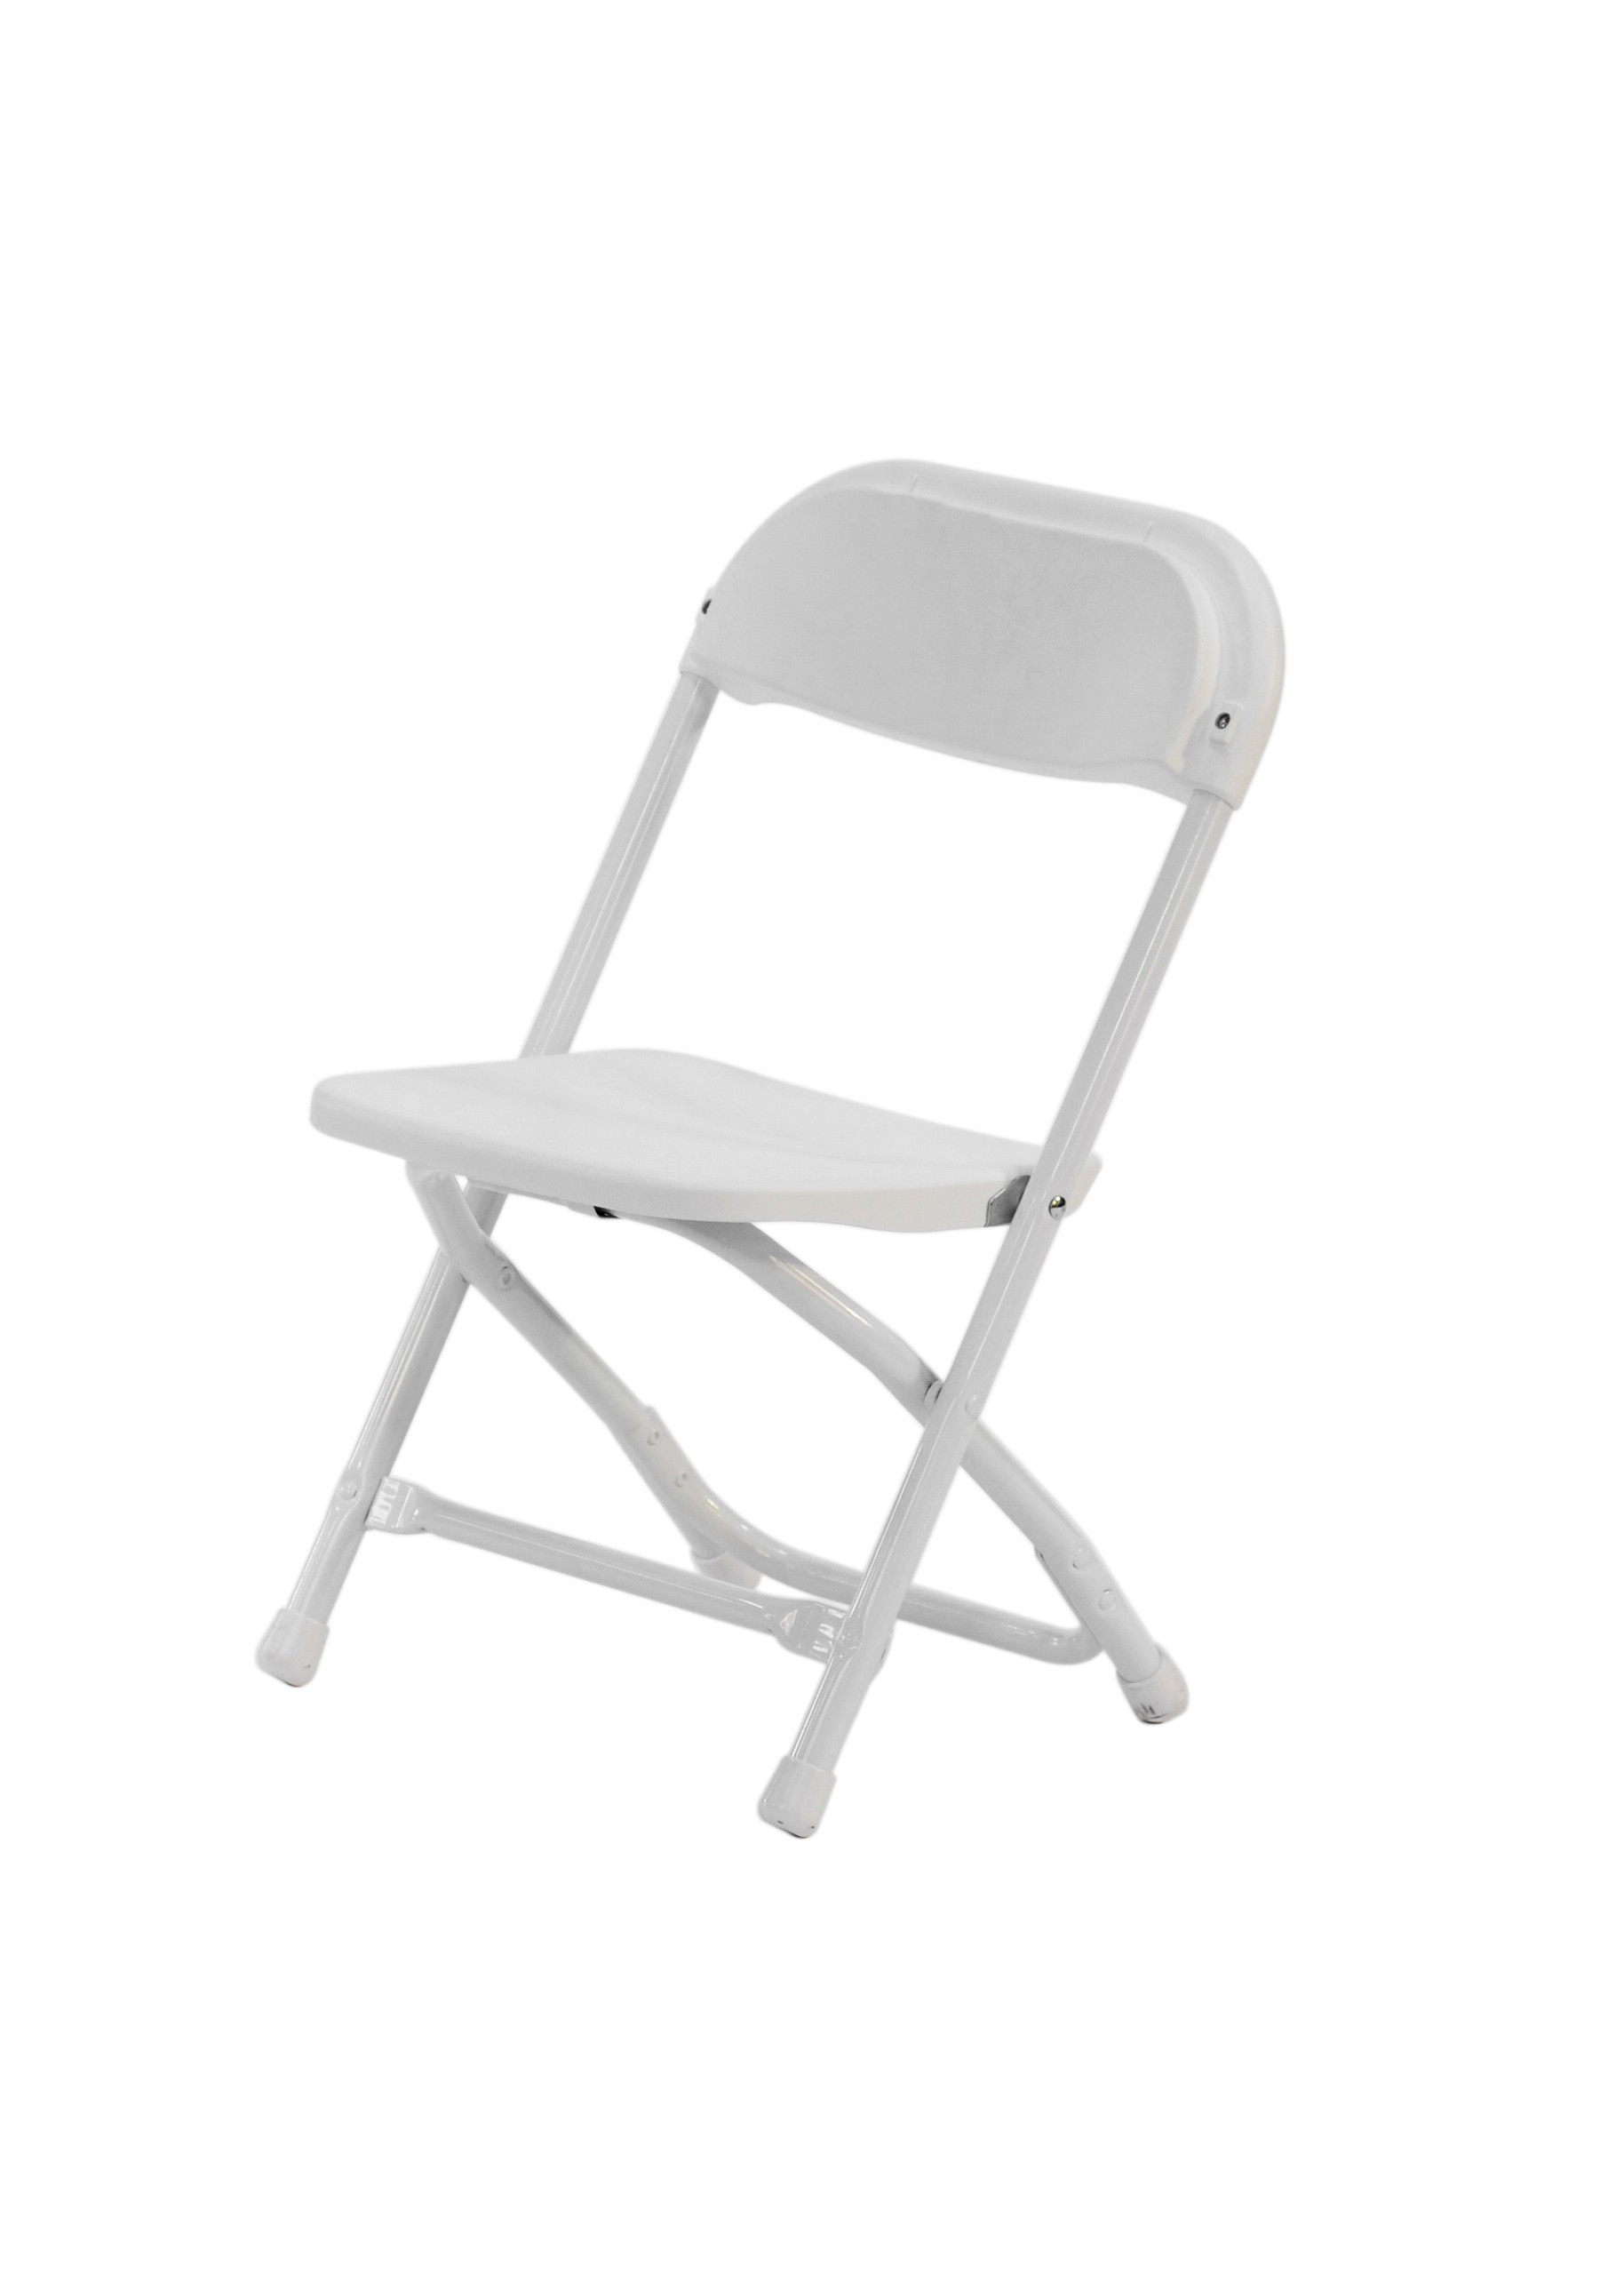 Pleasant Childrens Chair Machost Co Dining Chair Design Ideas Machostcouk